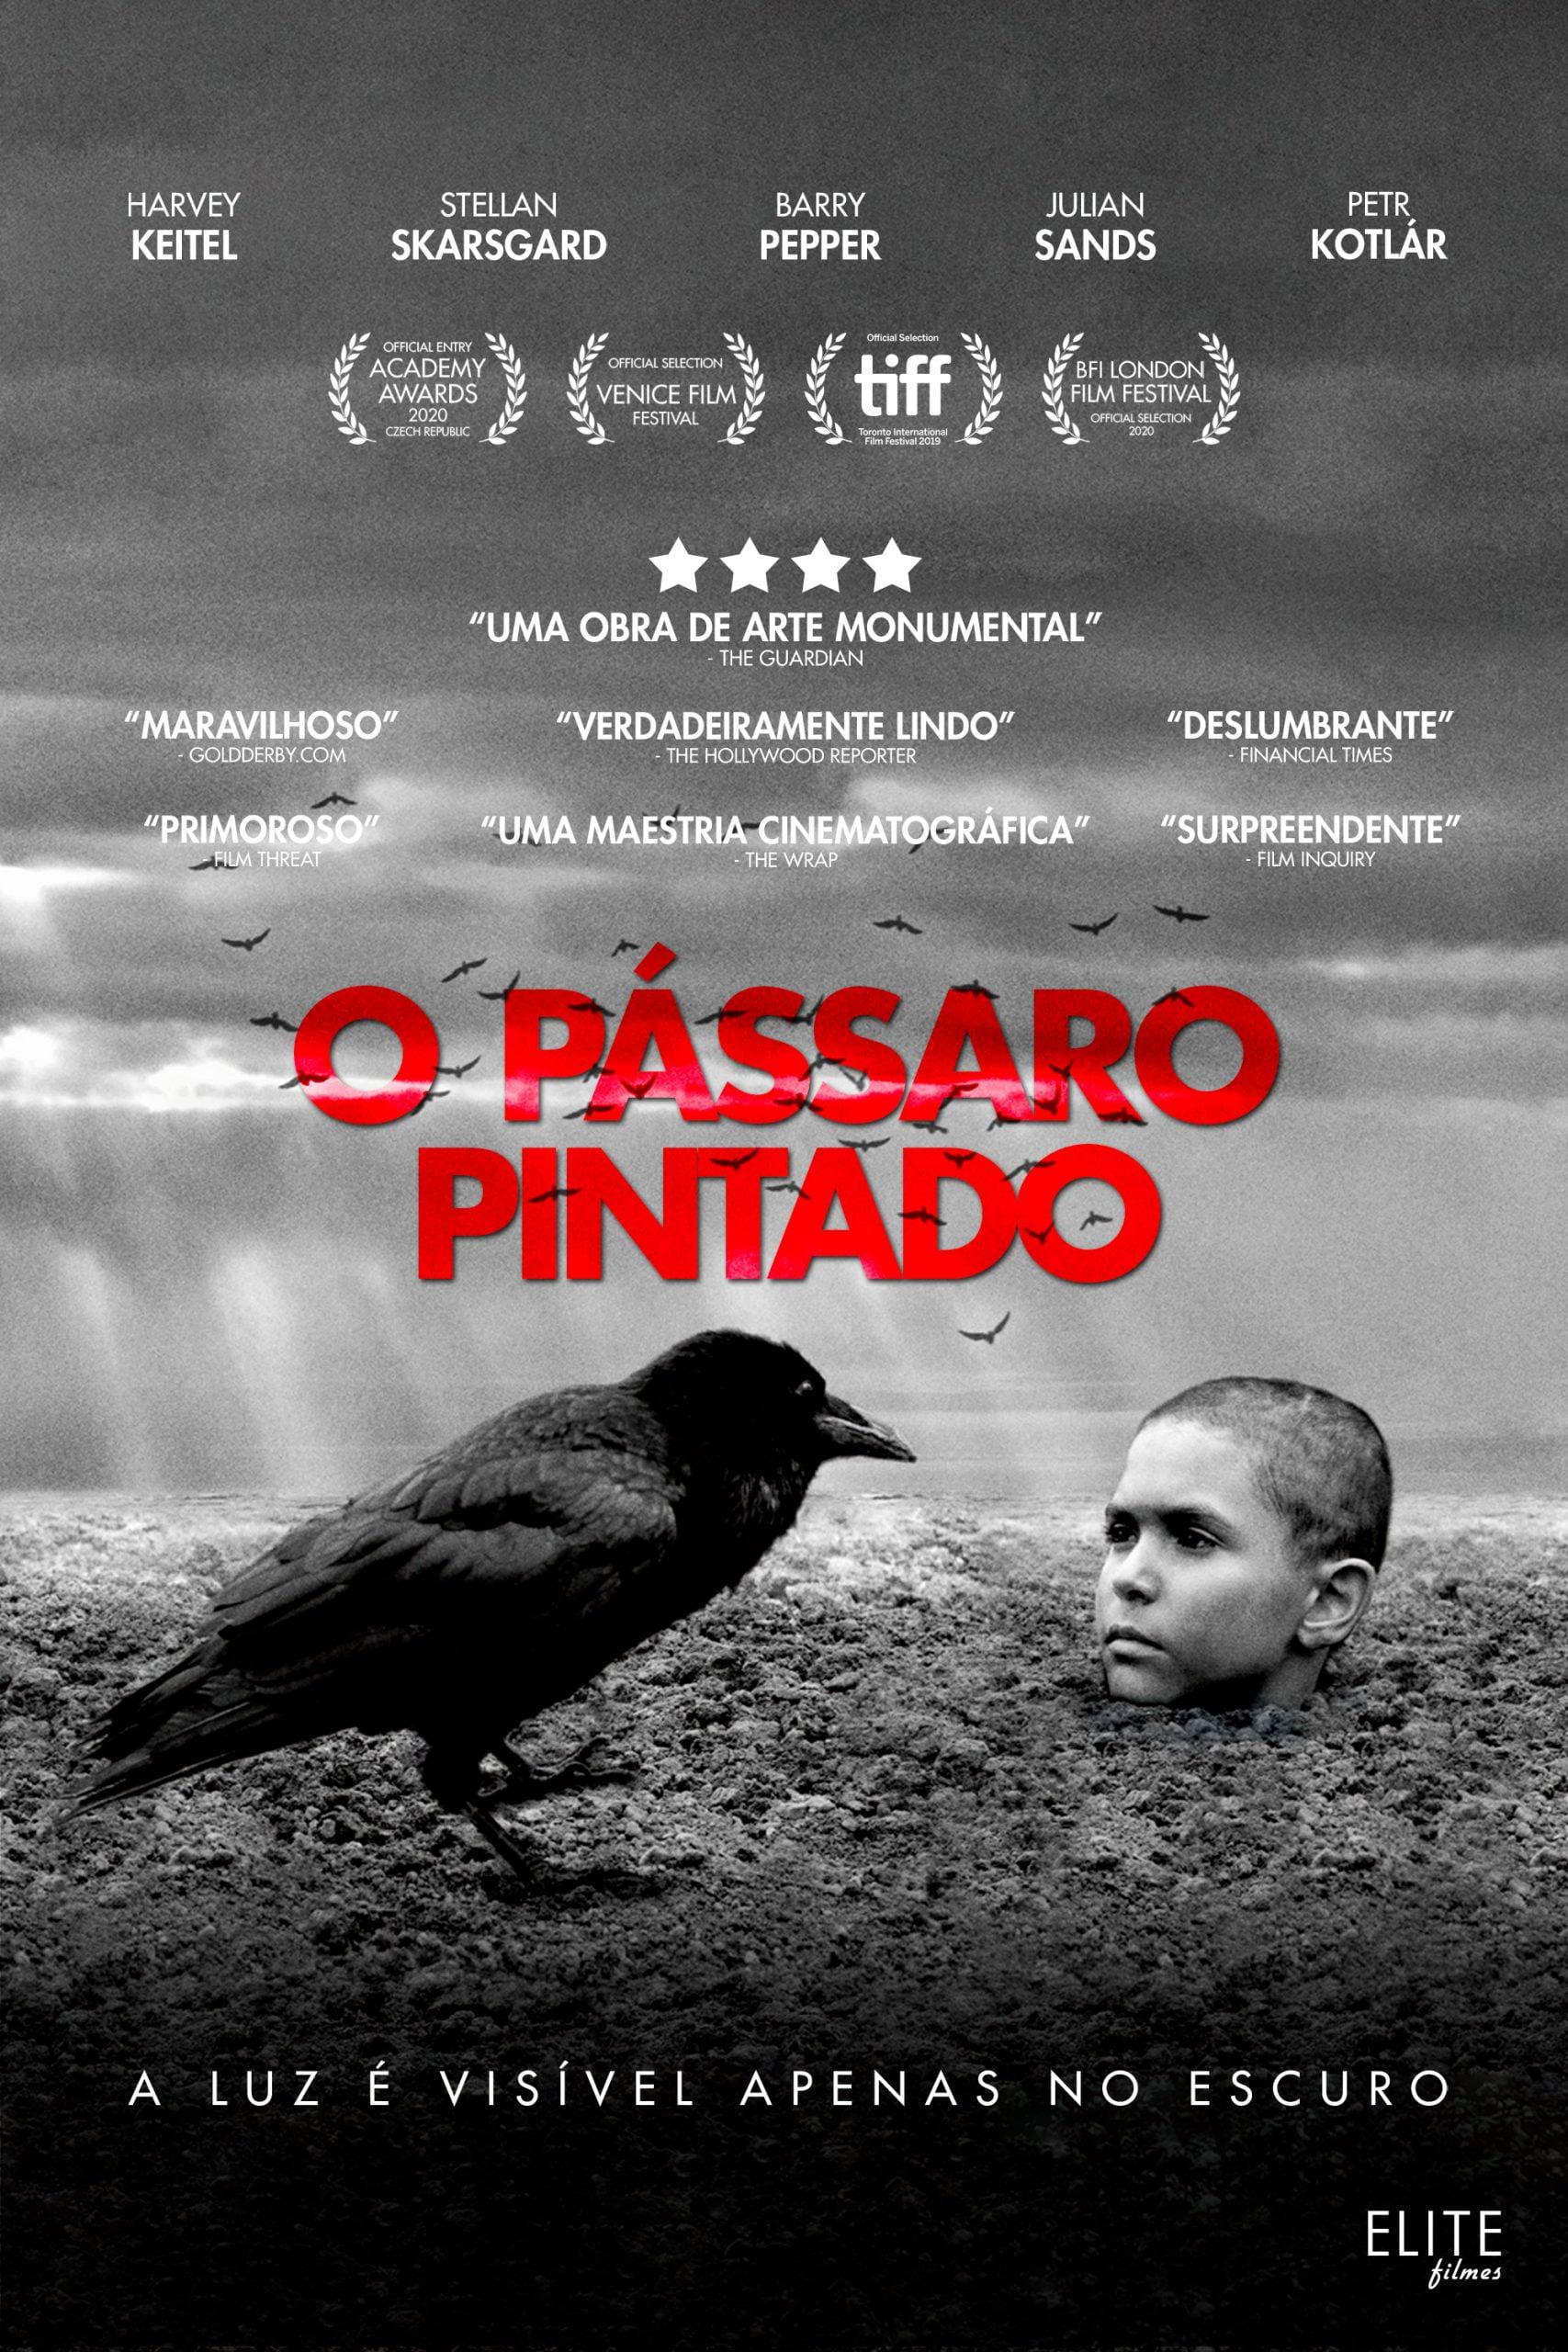 O Pássaro Pintado